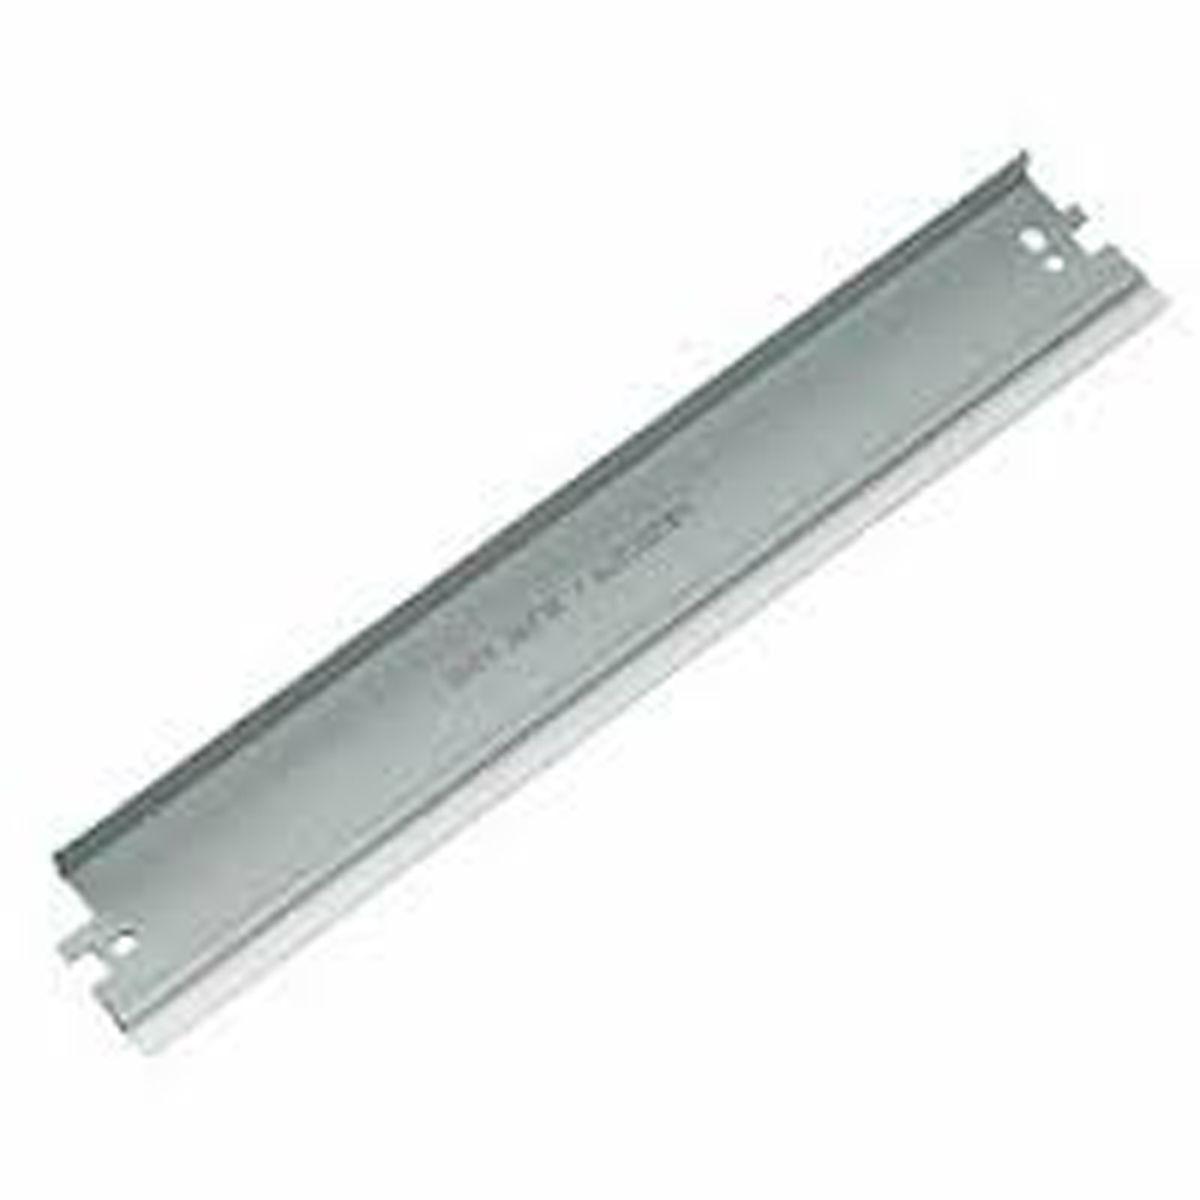 Lamina Limpeza Wiper Blade HP CB435 435A 435 - P1005 P1006